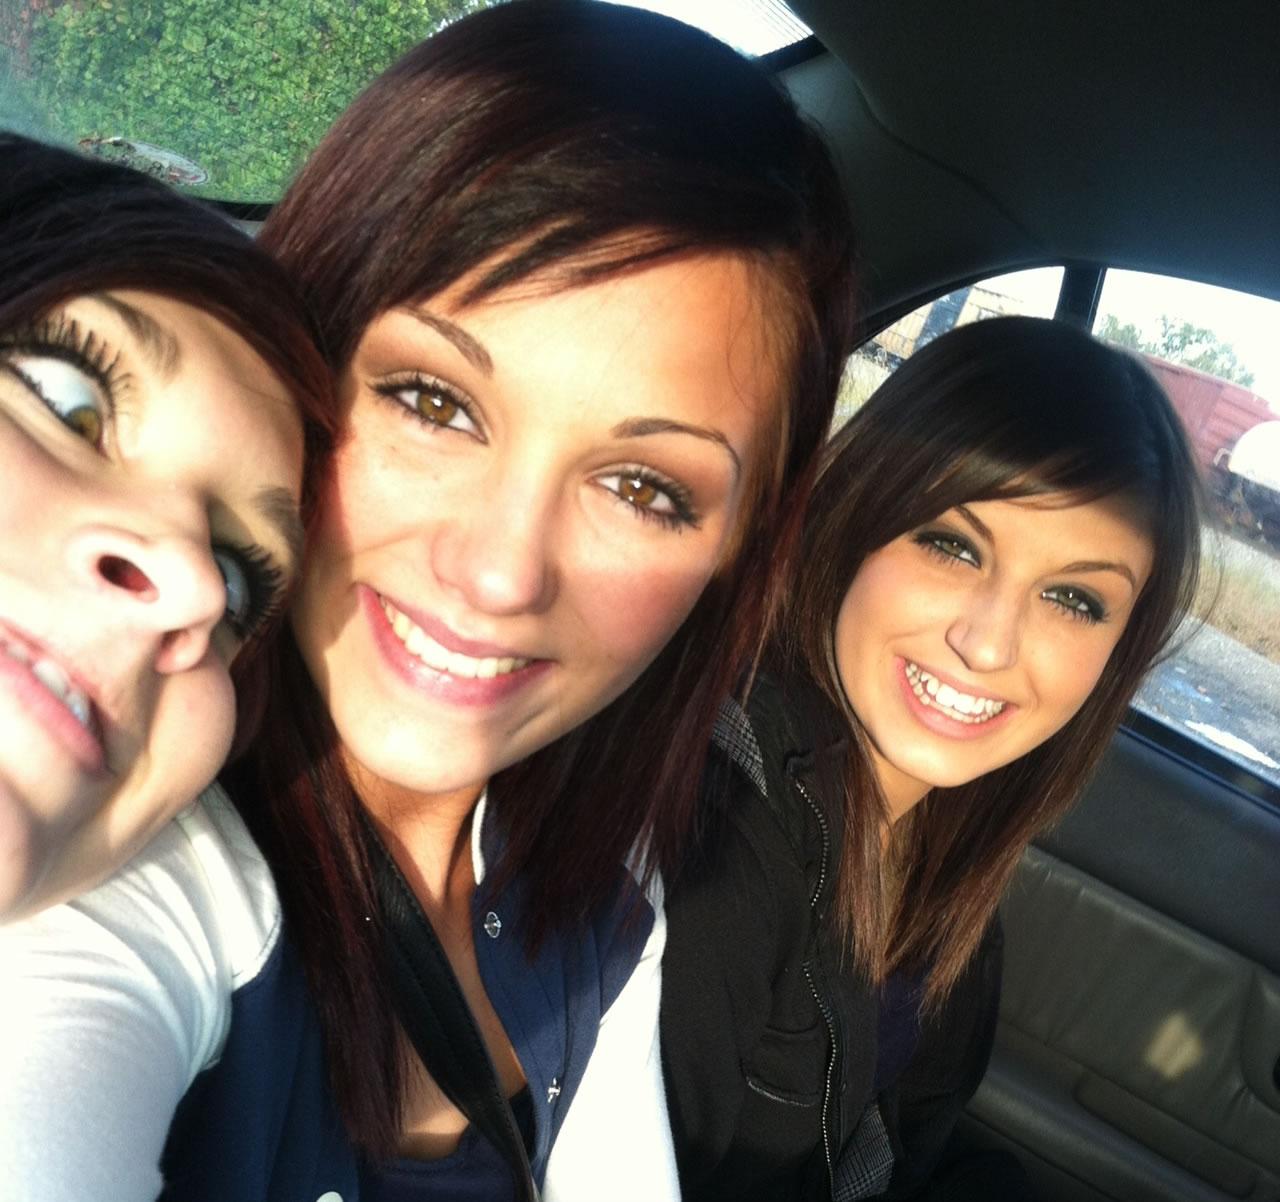 Sophie, Mackenzie and Skylar